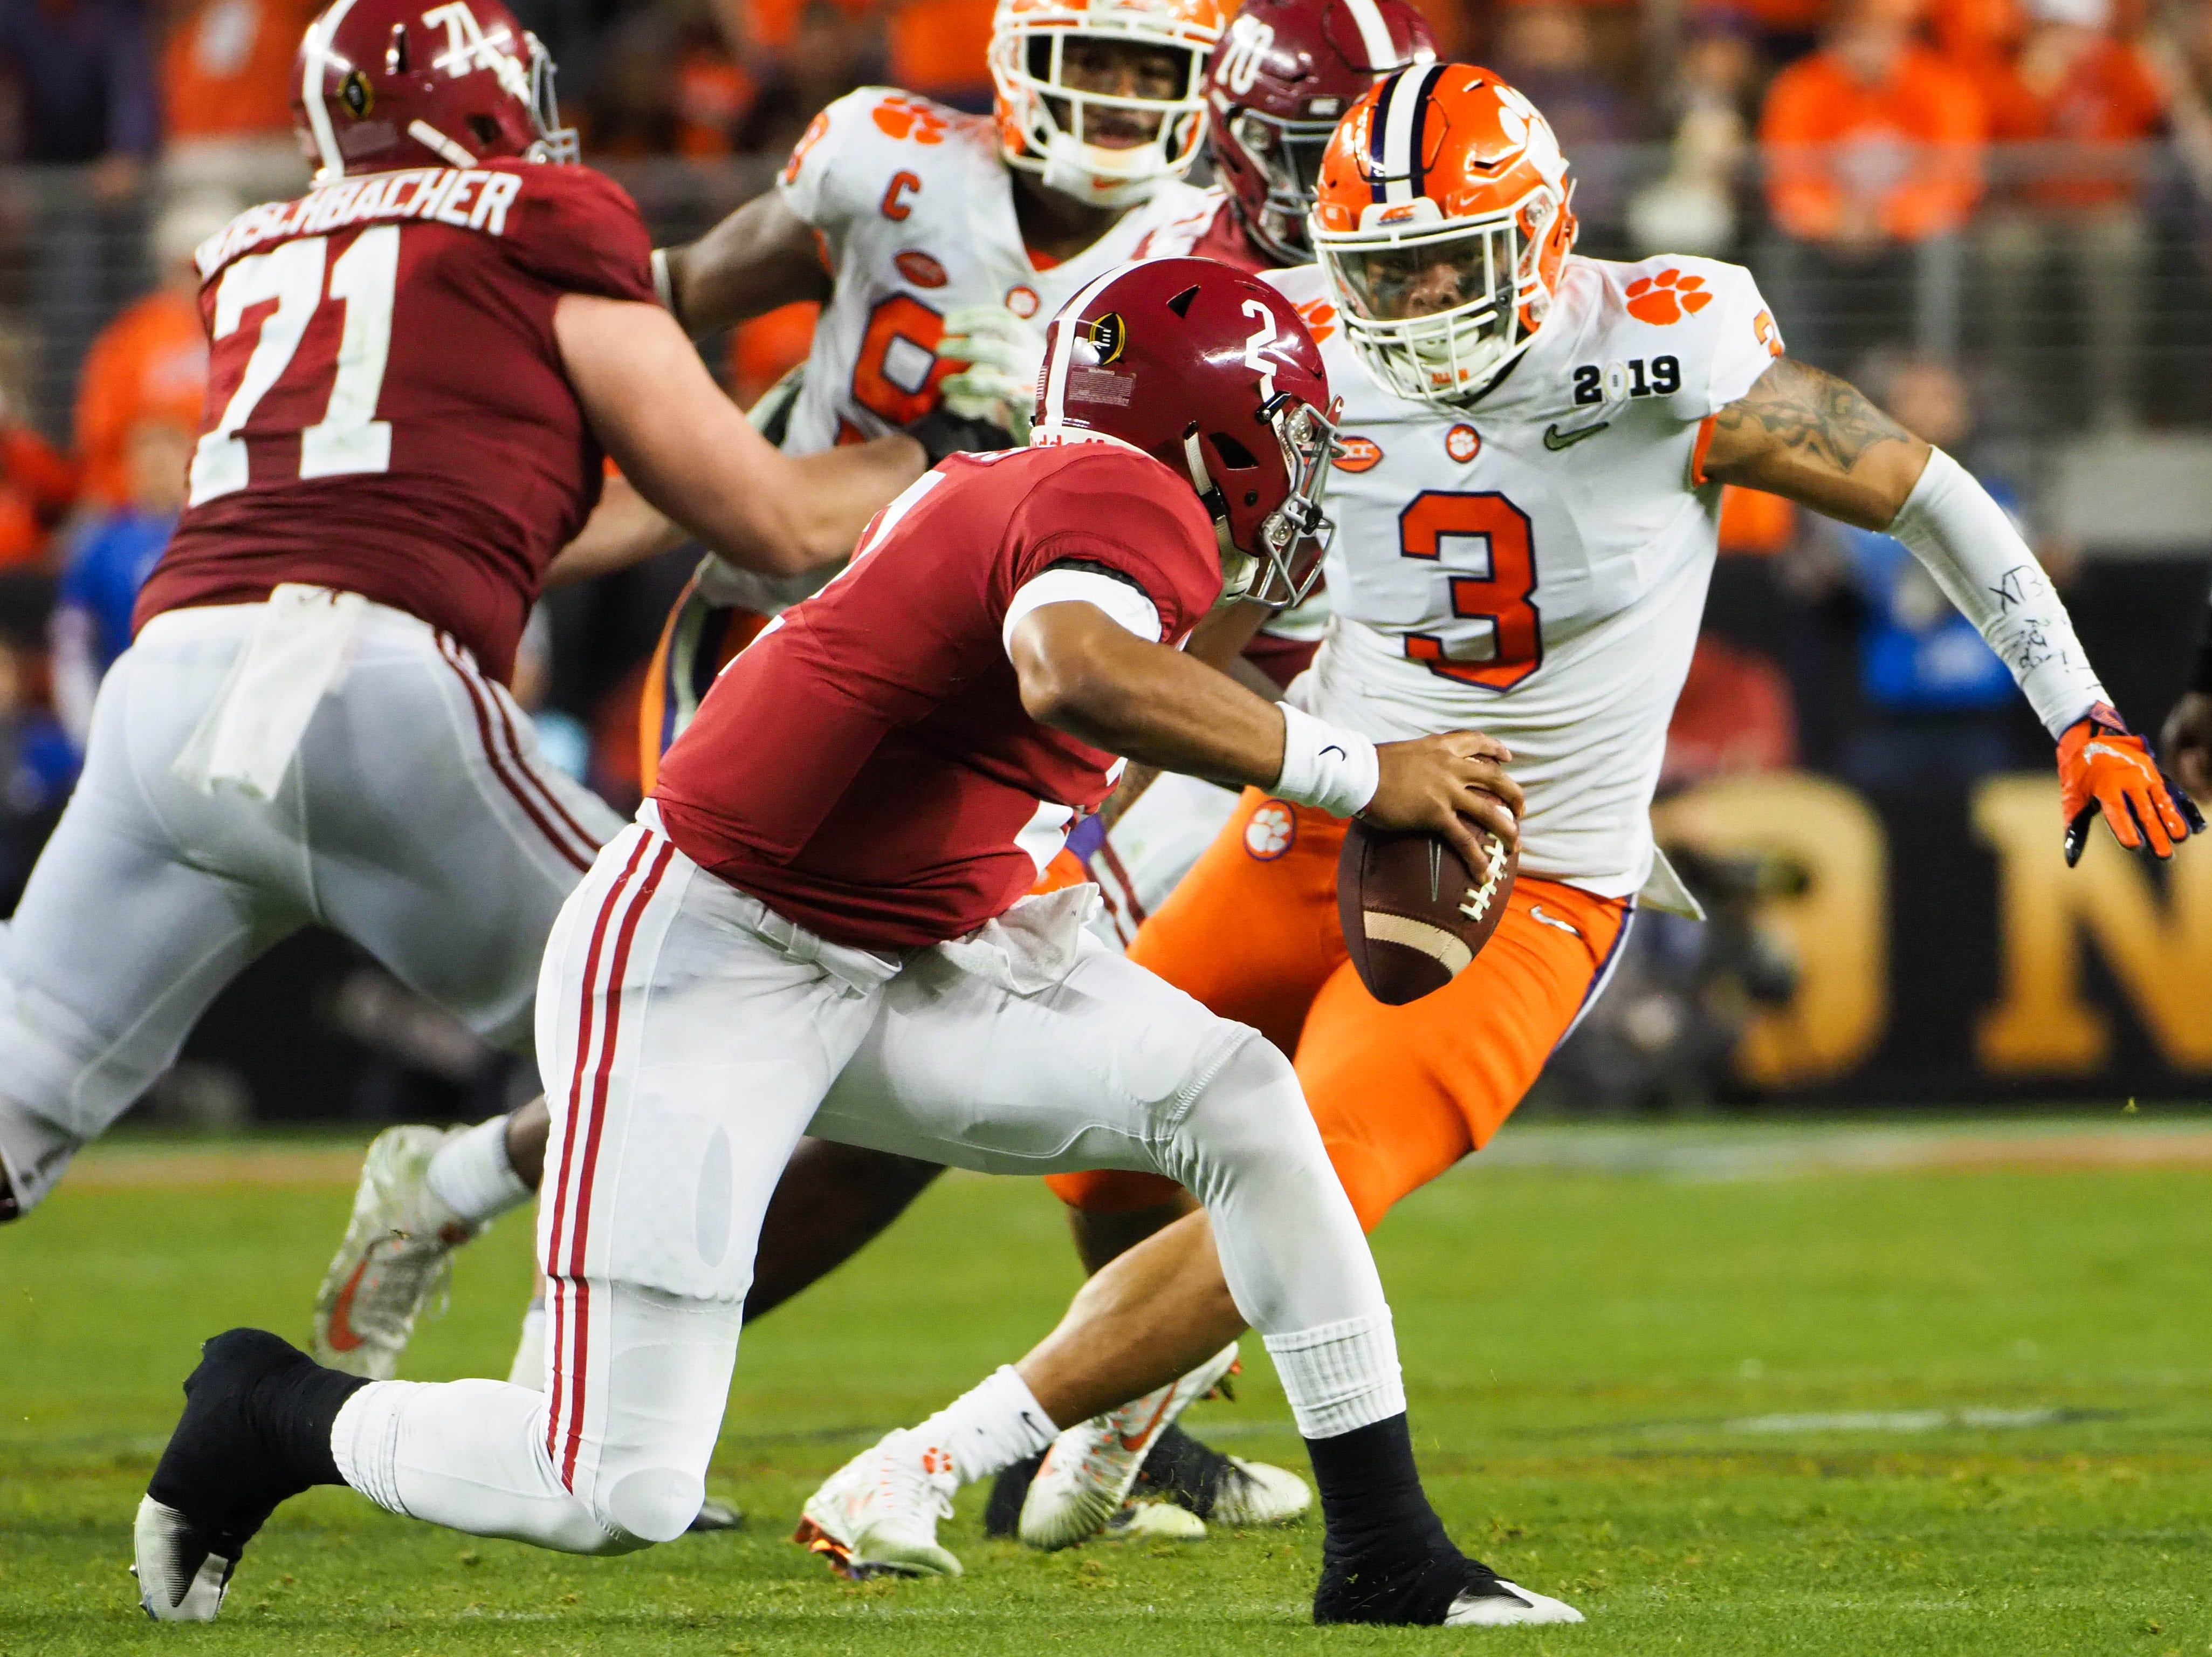 Alabama quarterback Jalen Hurts faces pressure in the fourth quarter.